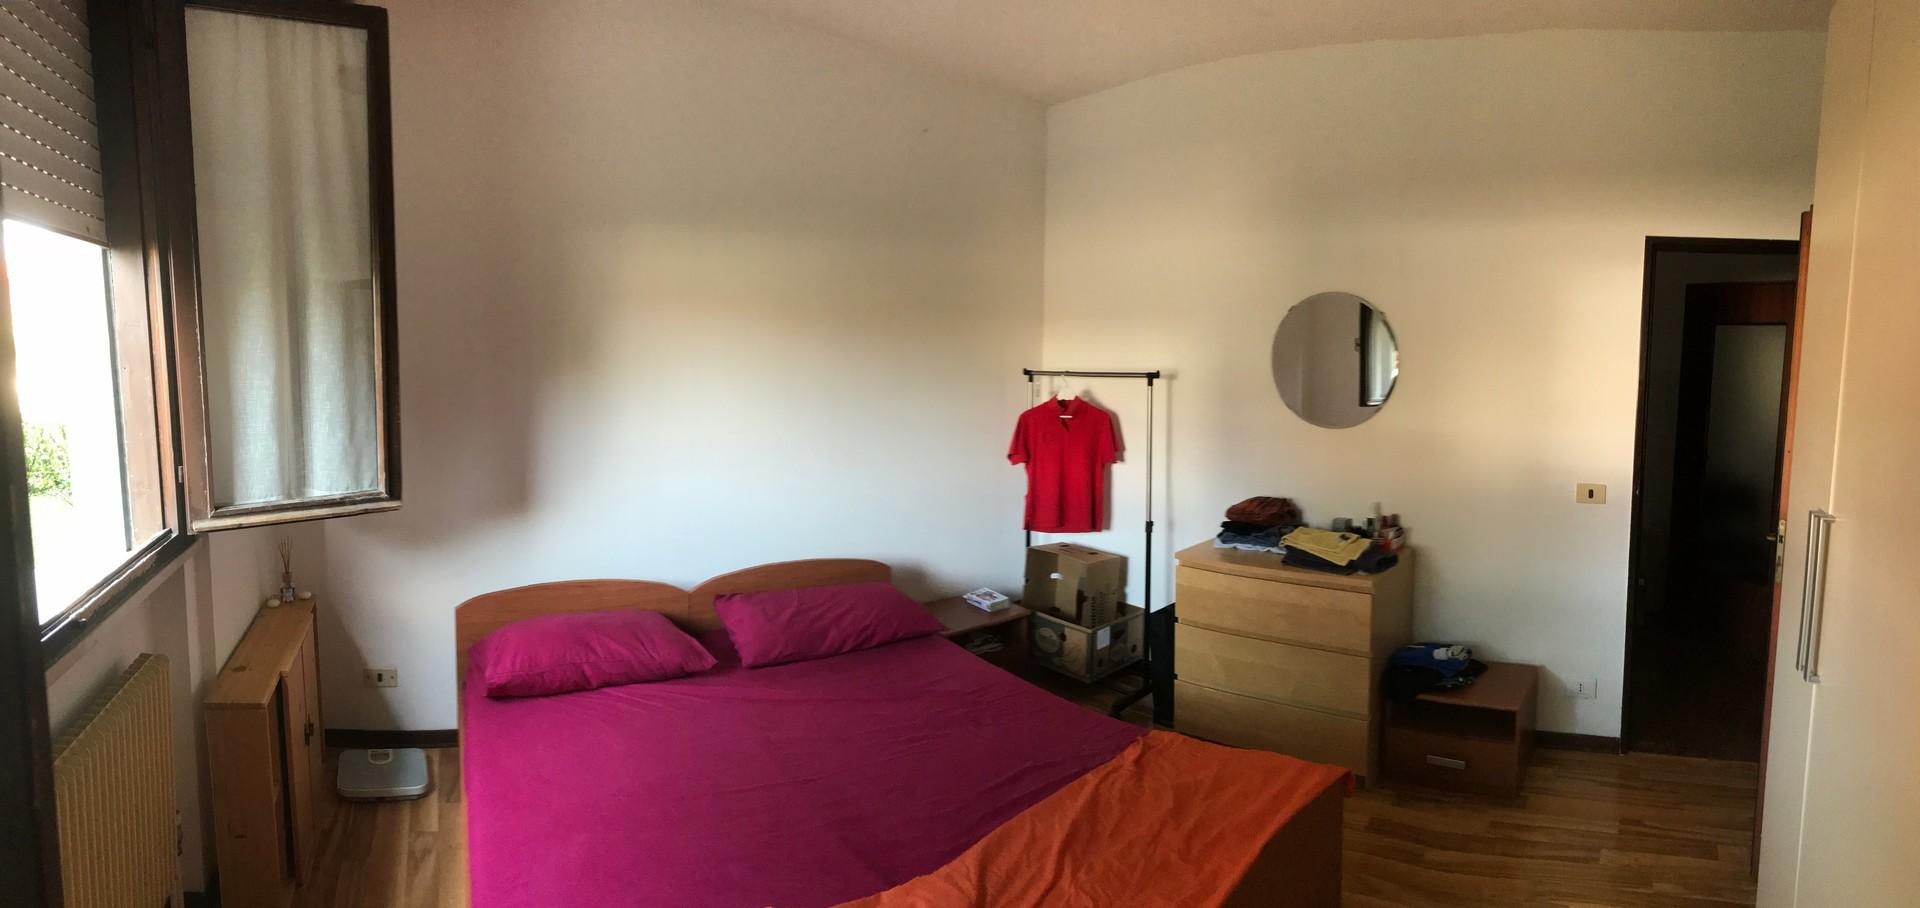 mini-appartamento-a-udine-5b6f07dd3d193751fca00a6163c99193